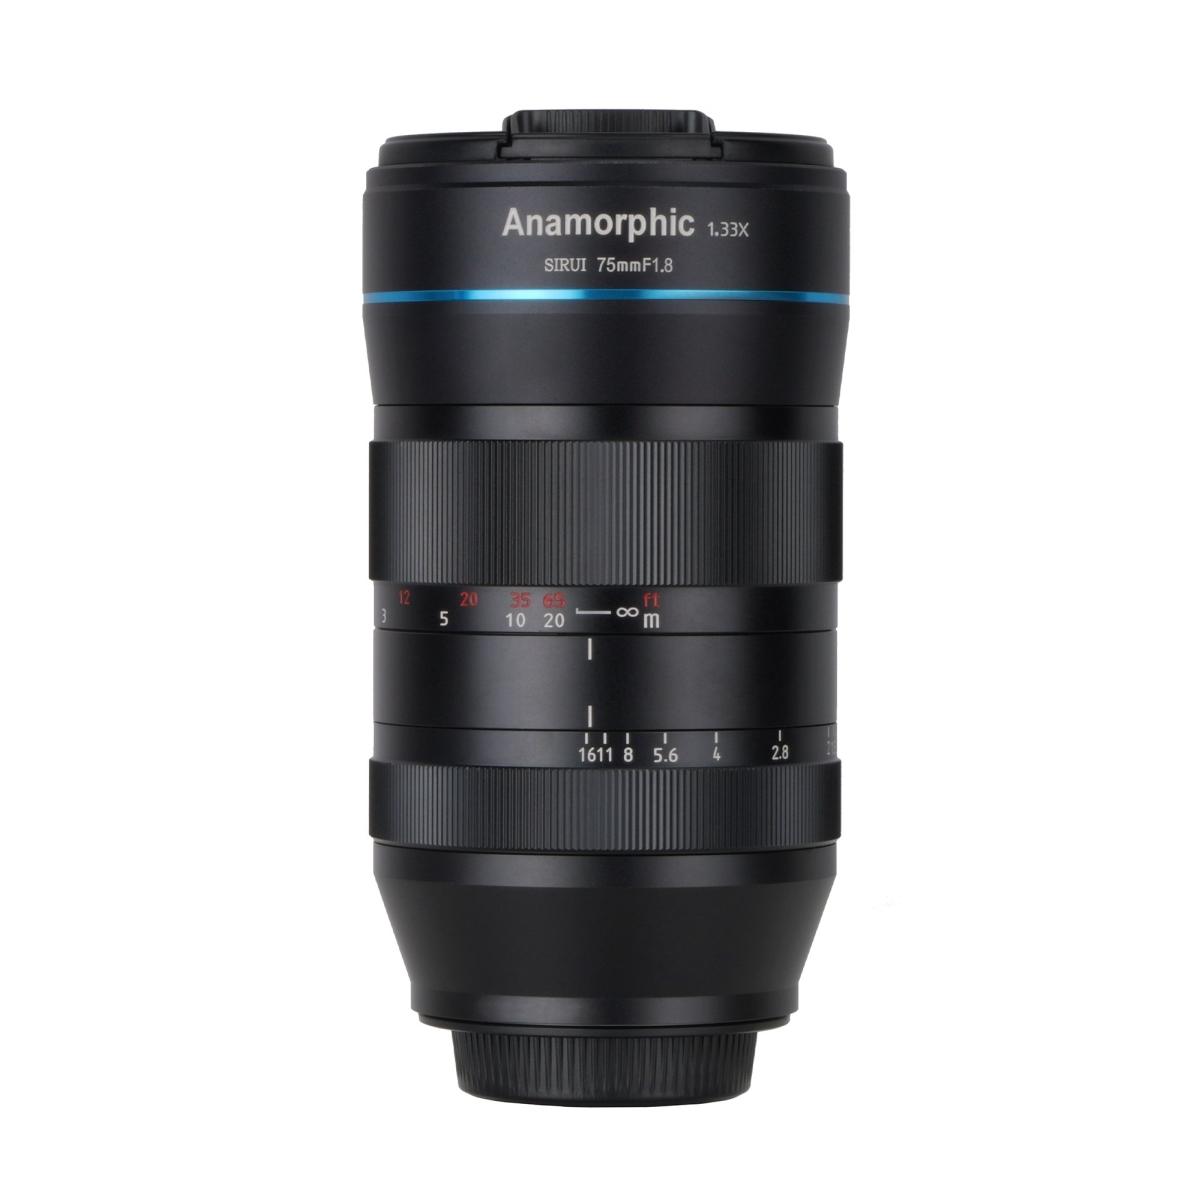 Sirui 75 mm 1:1,8 Anamorph 1,33x für Sony E-Mount